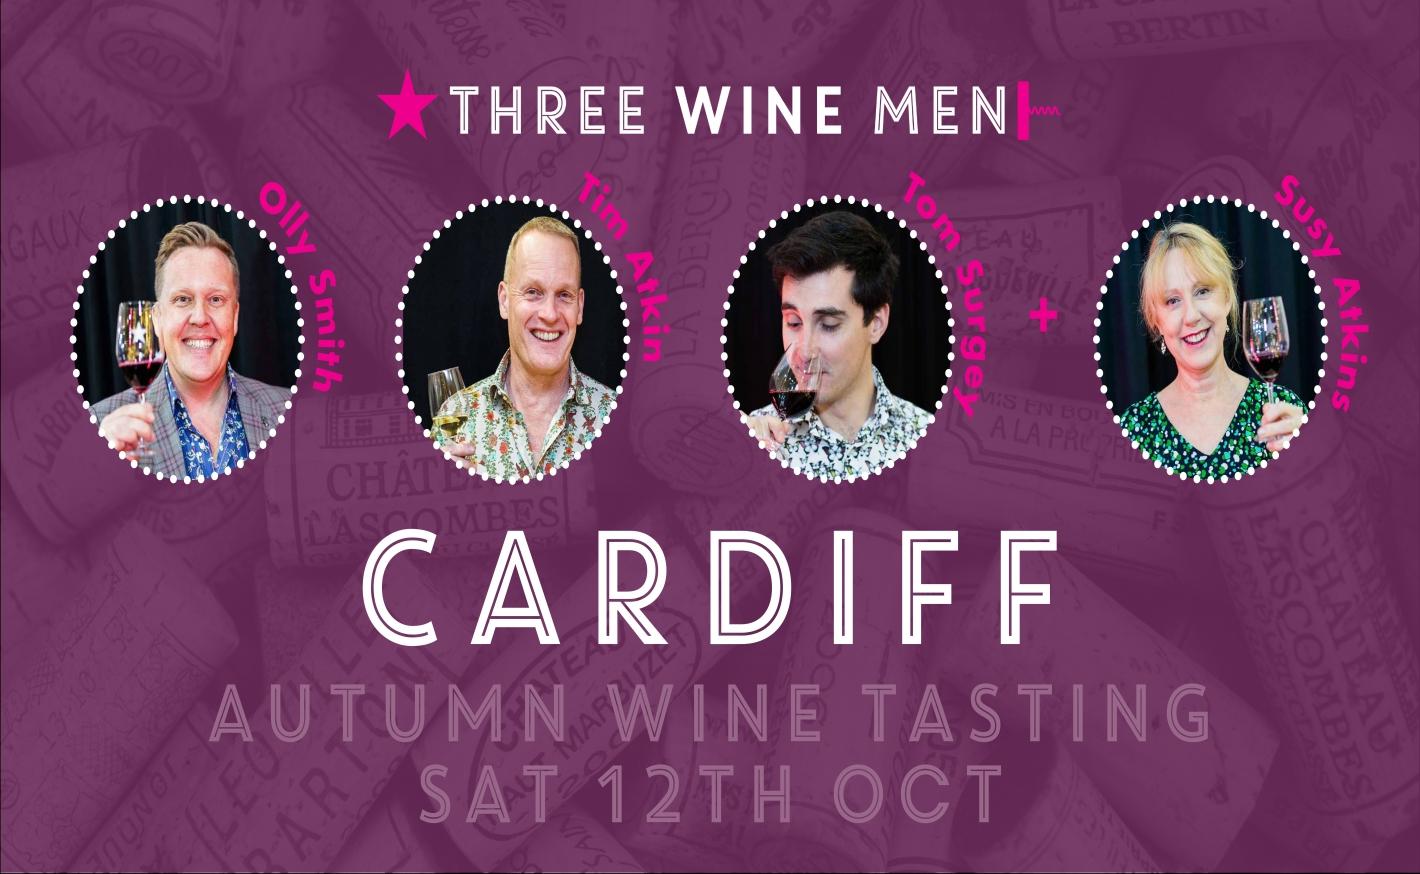 Noble Grape at The Three Wine Men